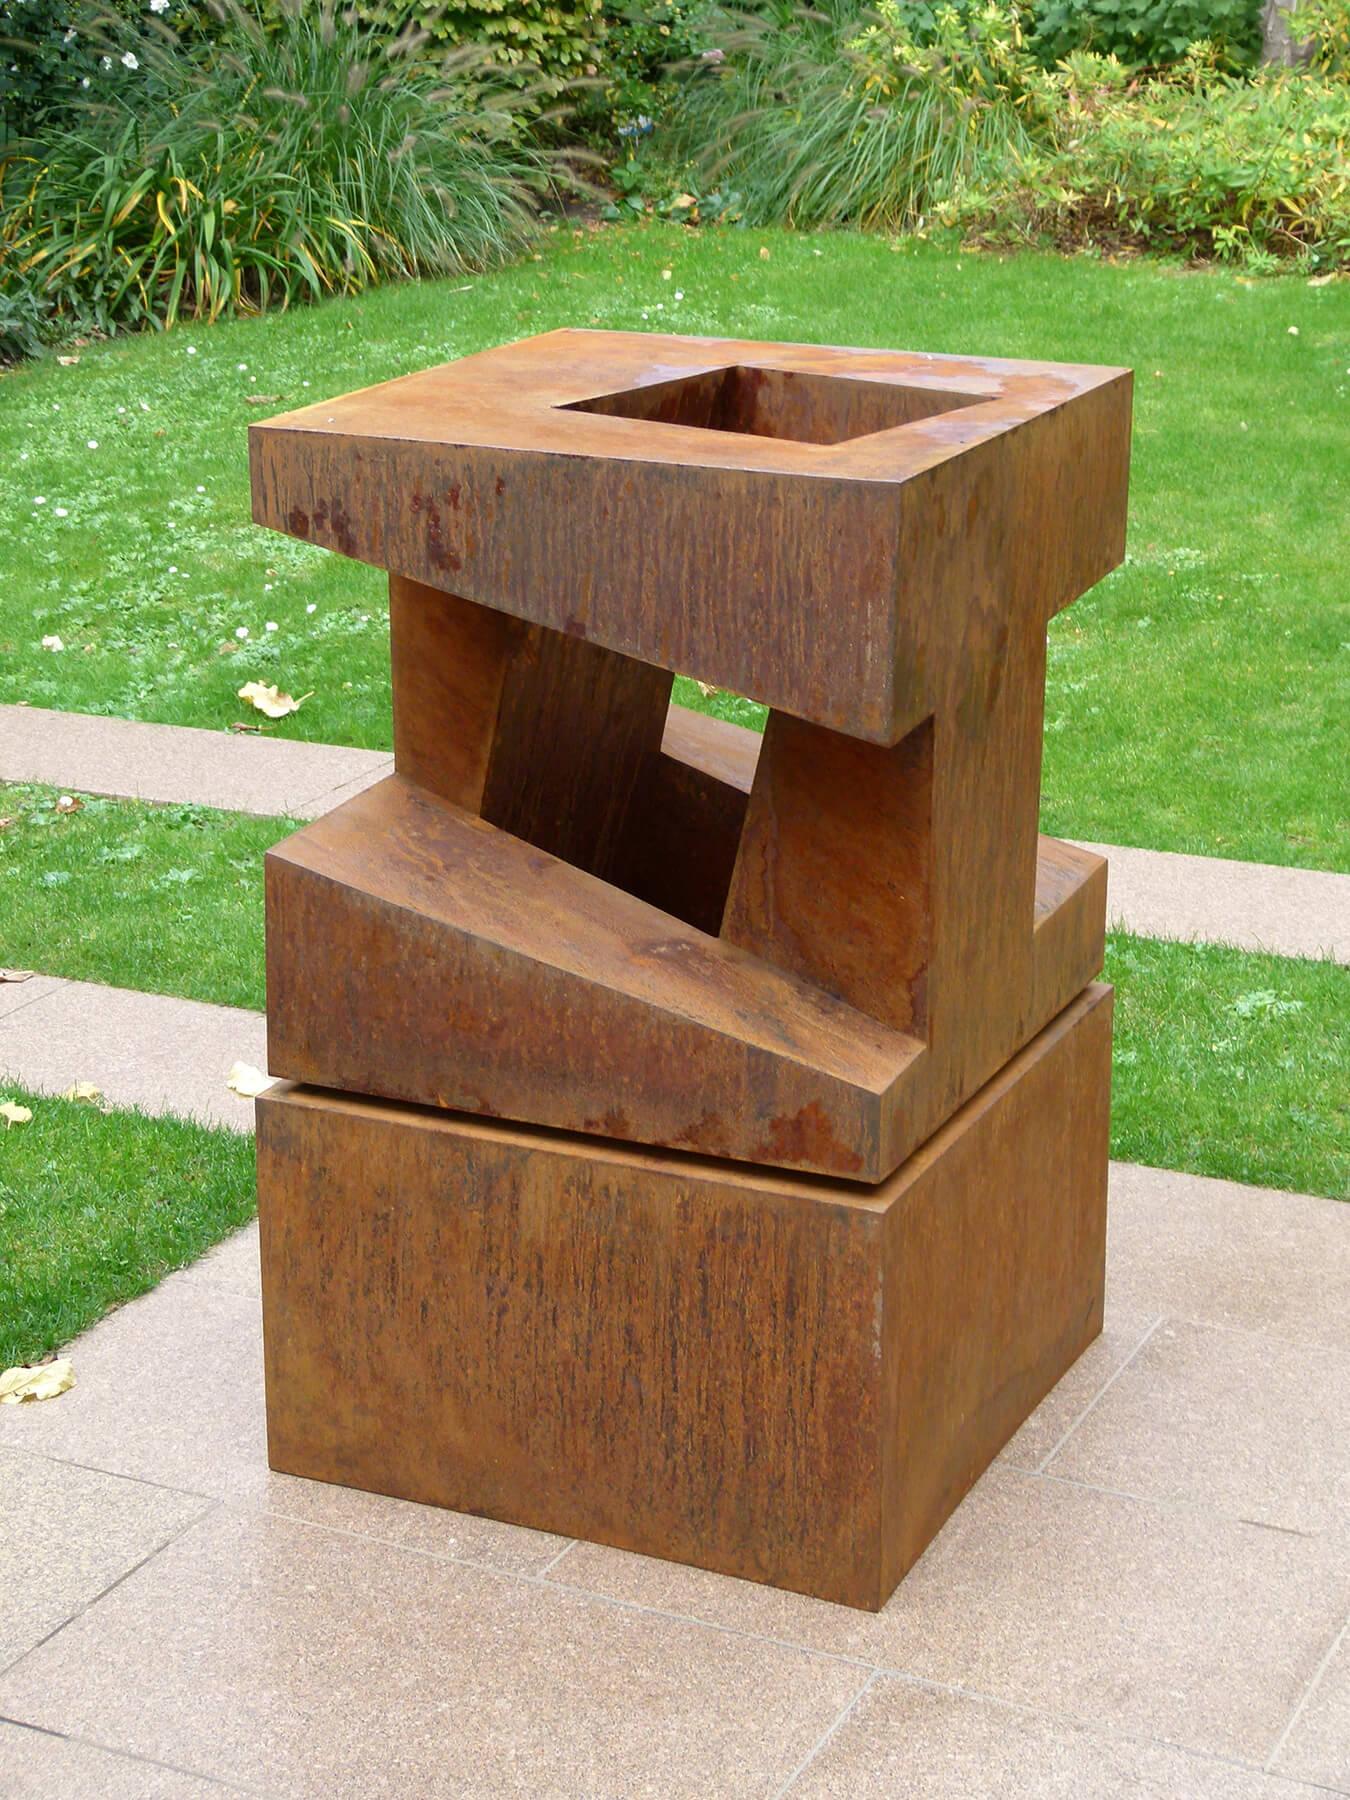 Bildhauer OMI Riesterer Skulpturen Stahlwürfel